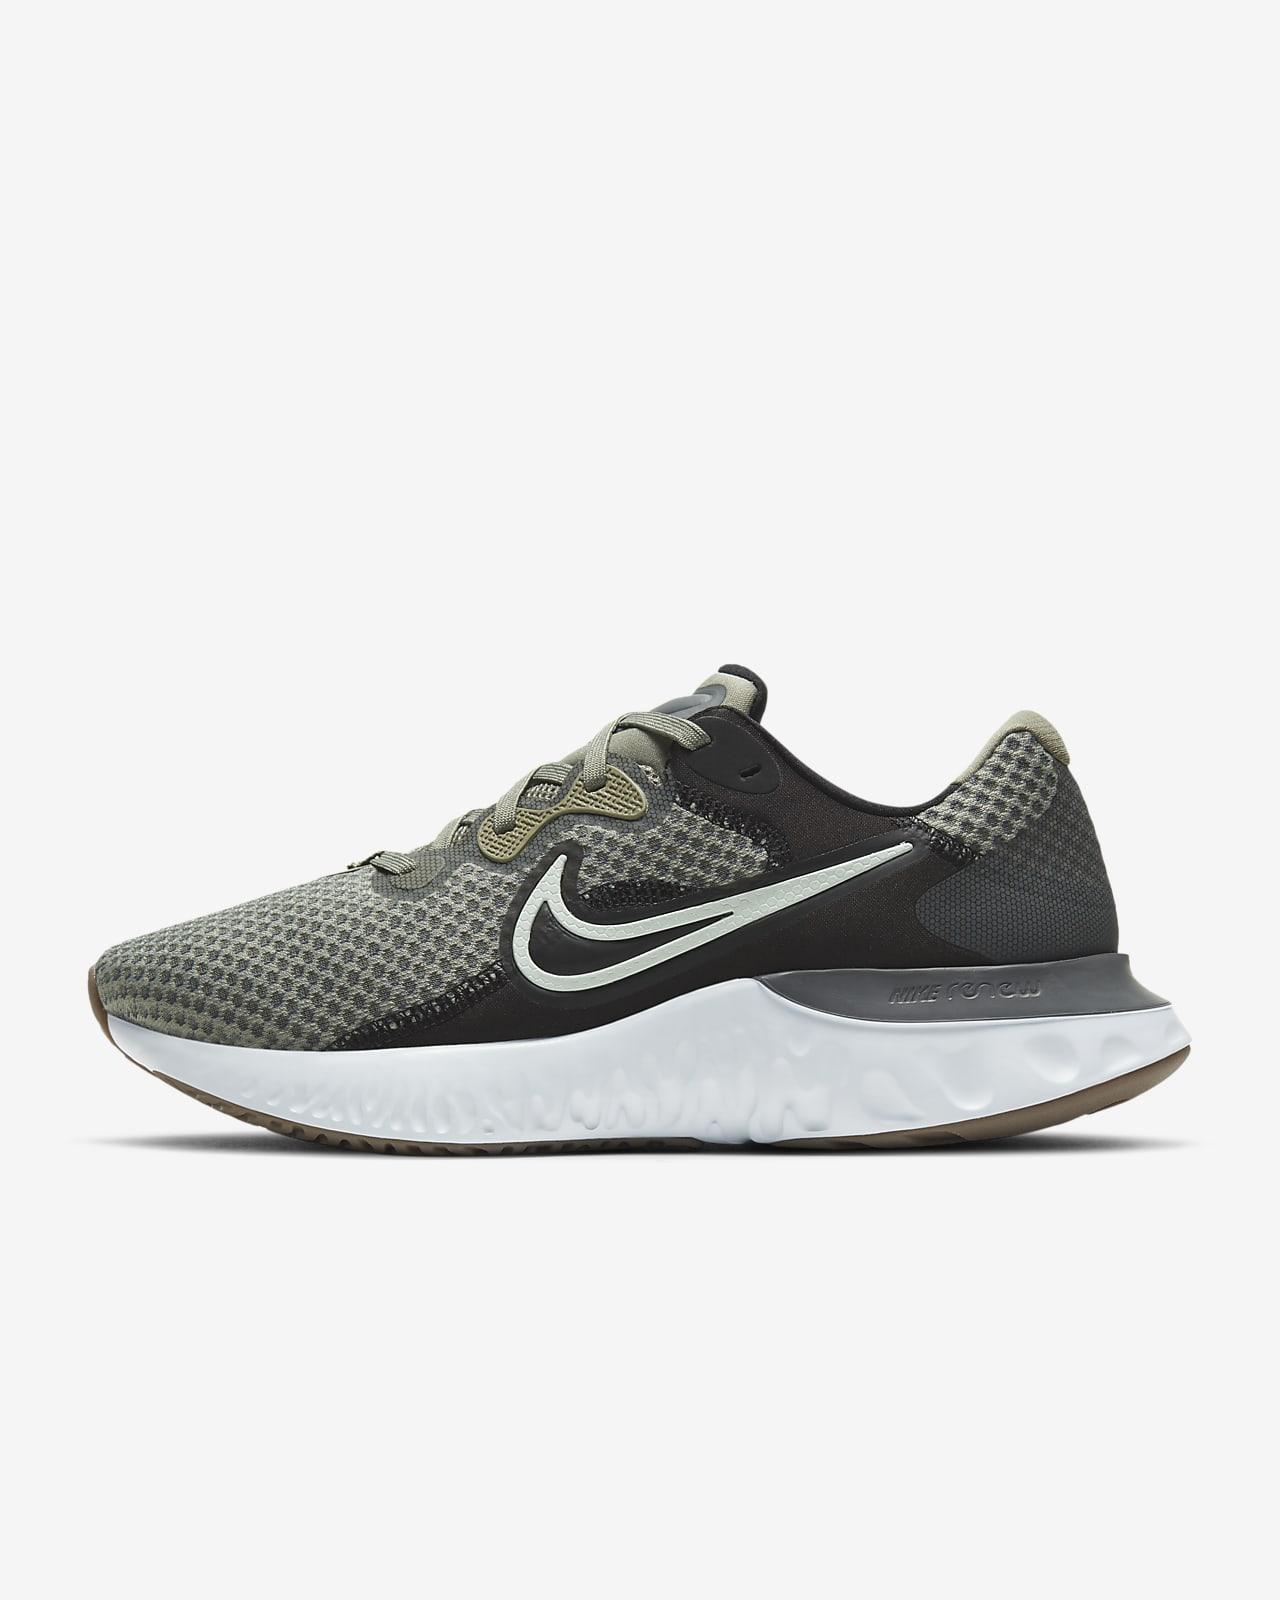 Nike Renew Run 2 Men's Running Shoe